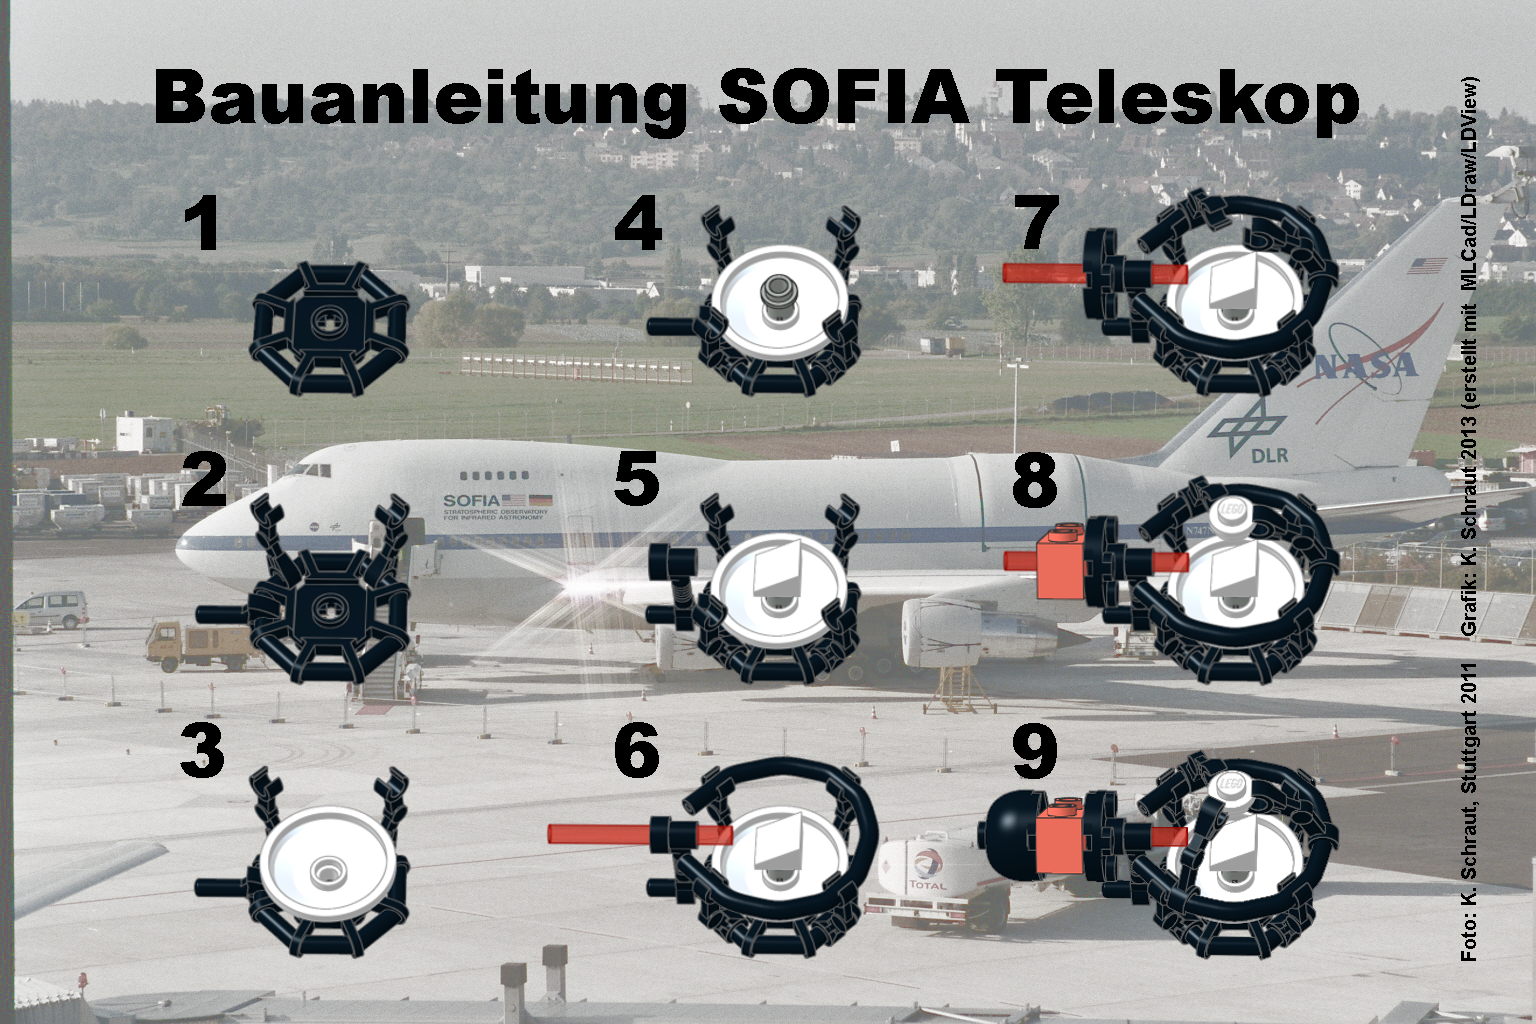 Bauanleitung für das Lego-Modell des SOFIA-Teleskops